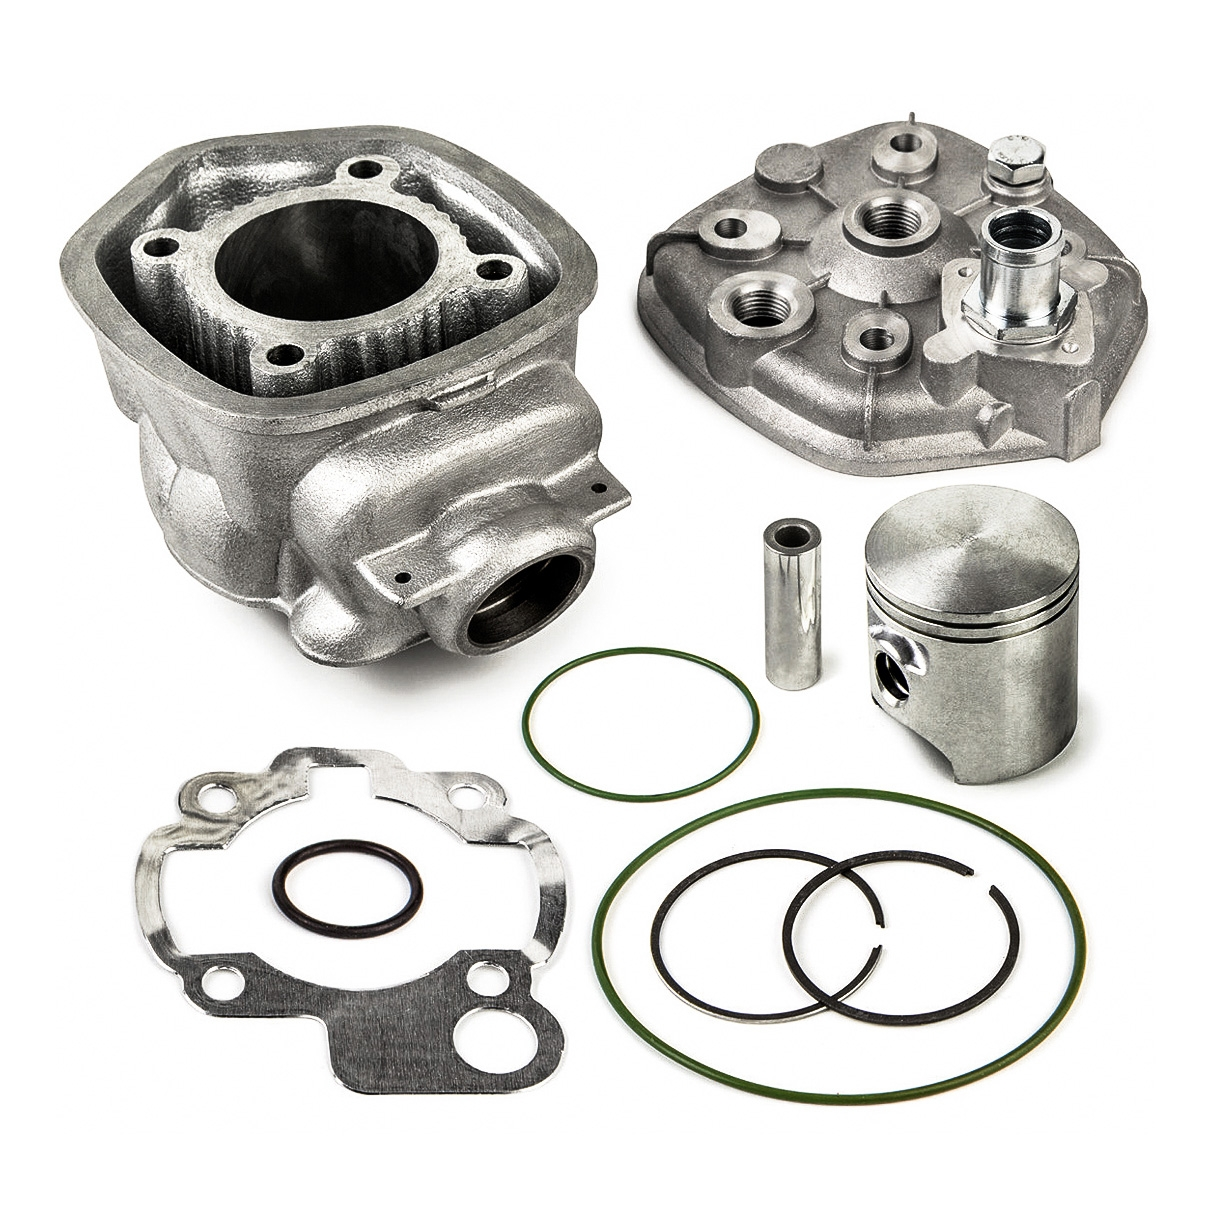 Cylindre culasse Airsal Fonte Minatelli AM6